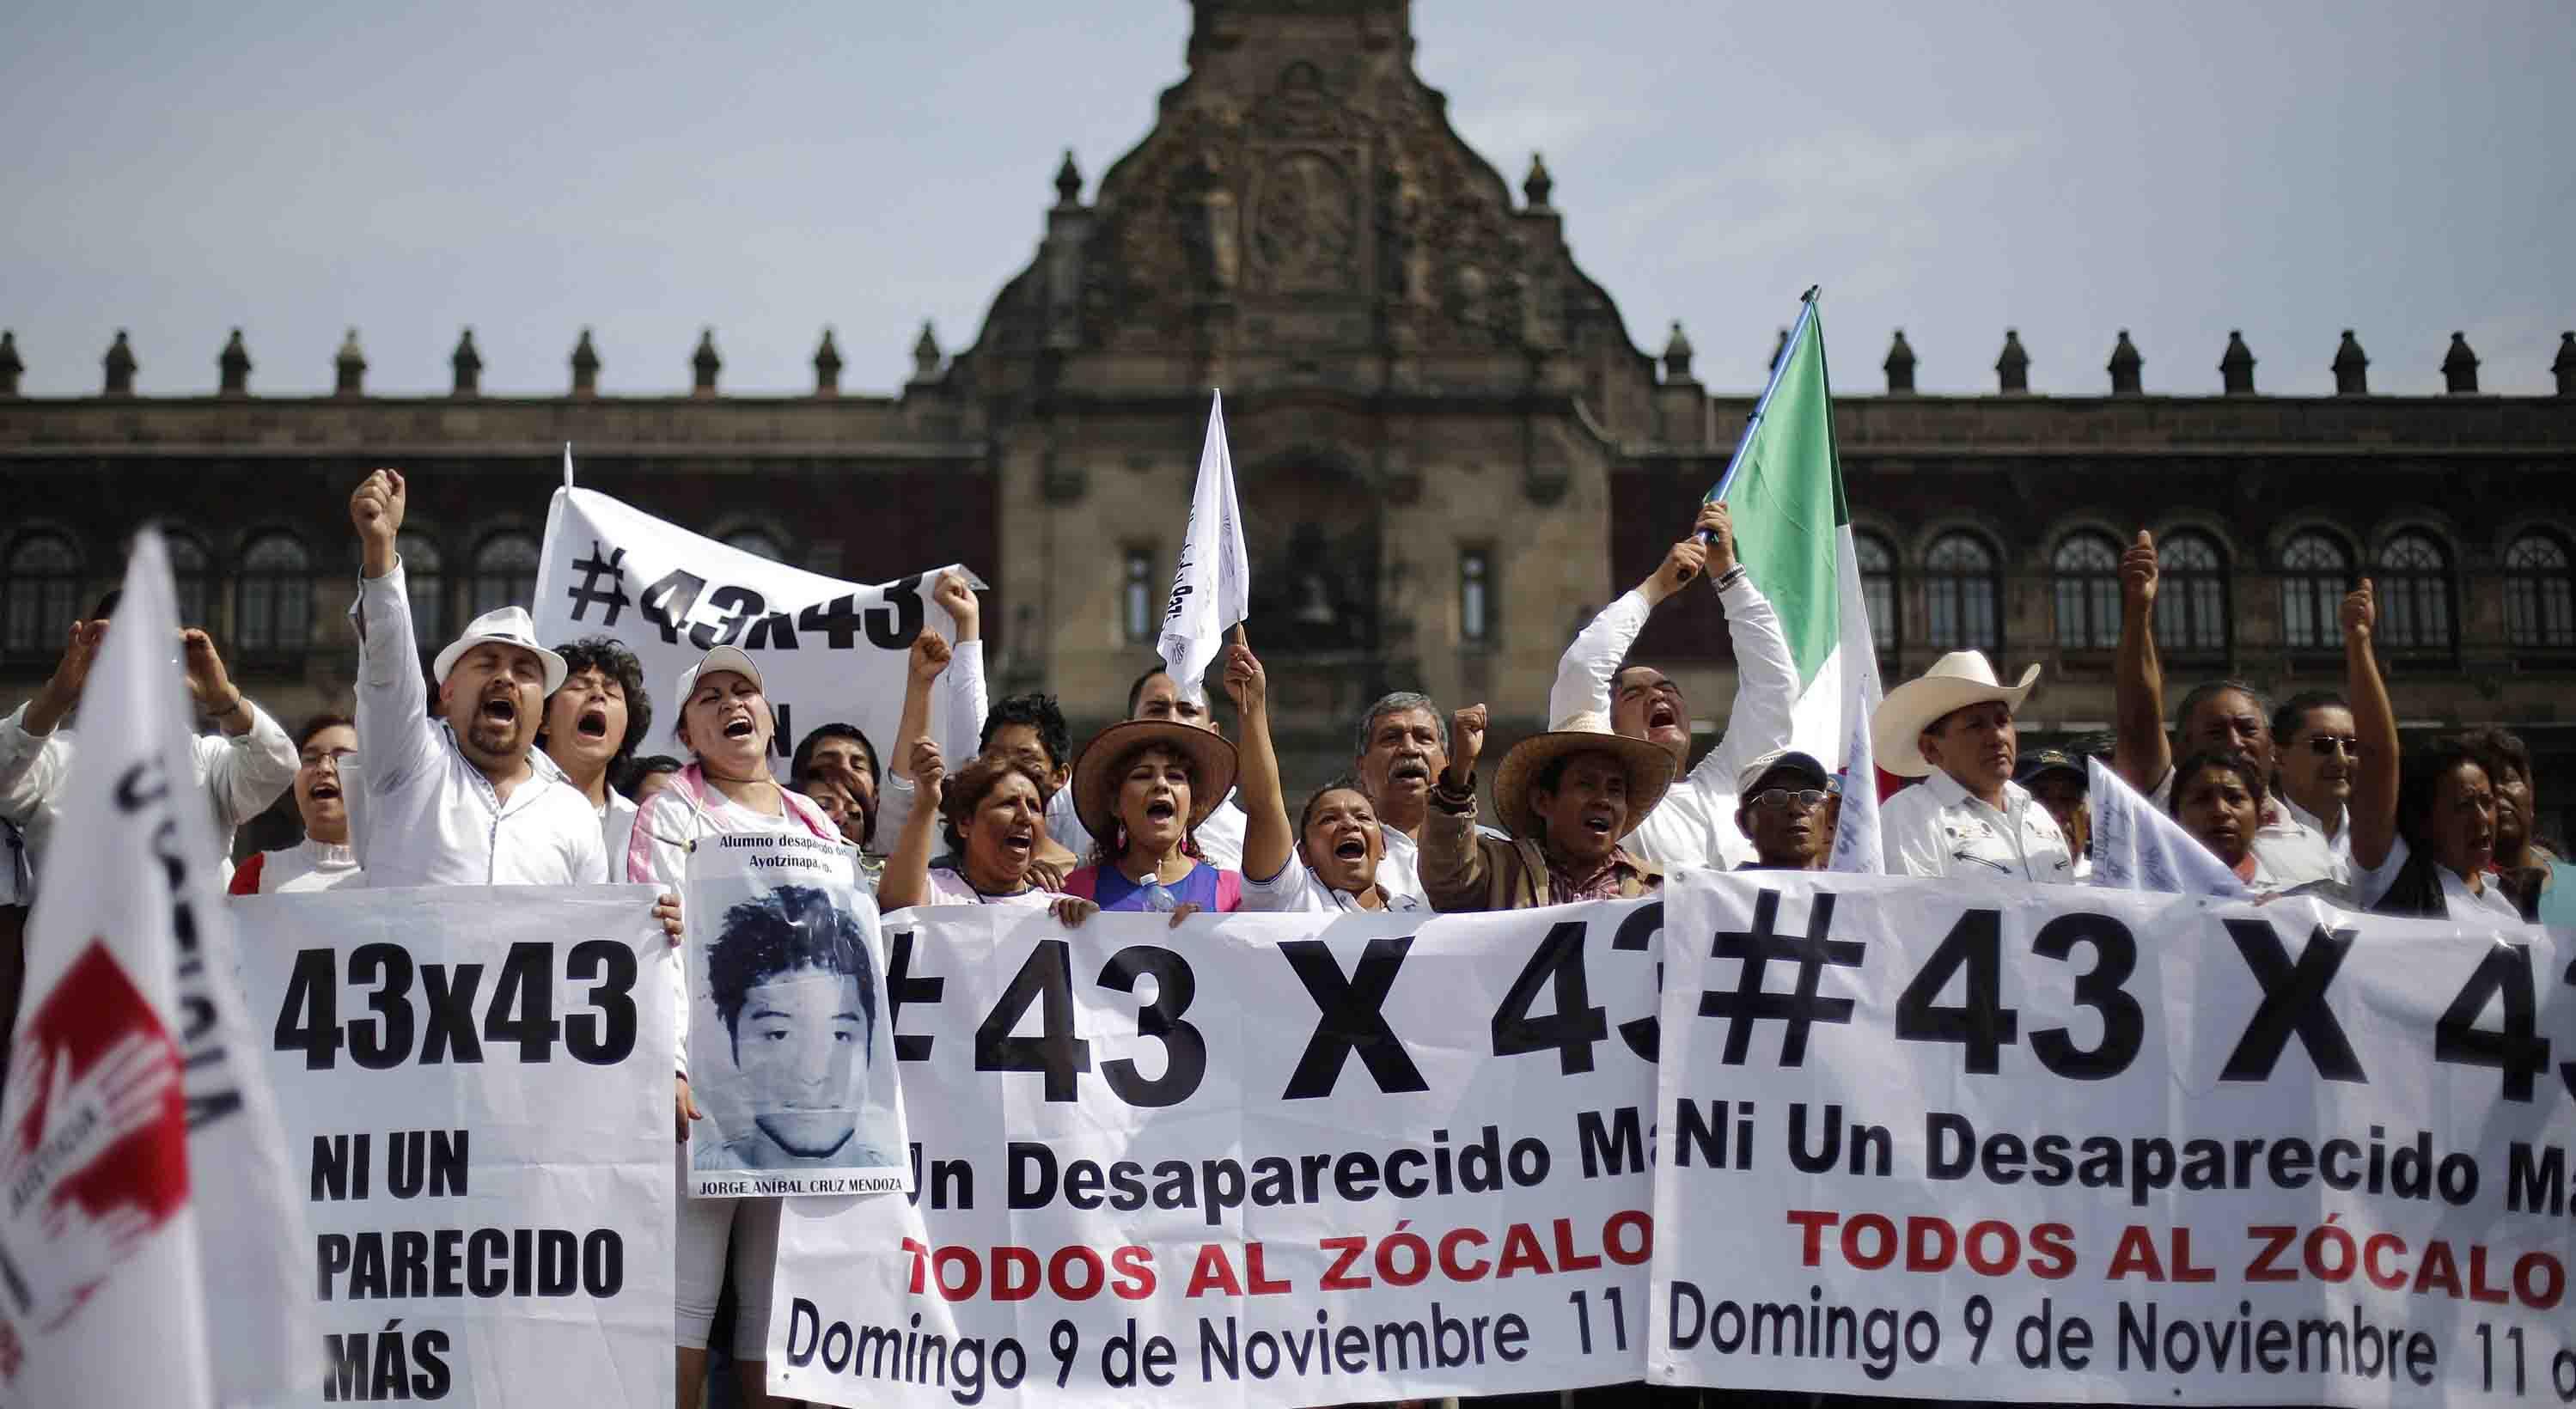 Corte Interamericana de Derechos Humanos discute desaparición forzada en México